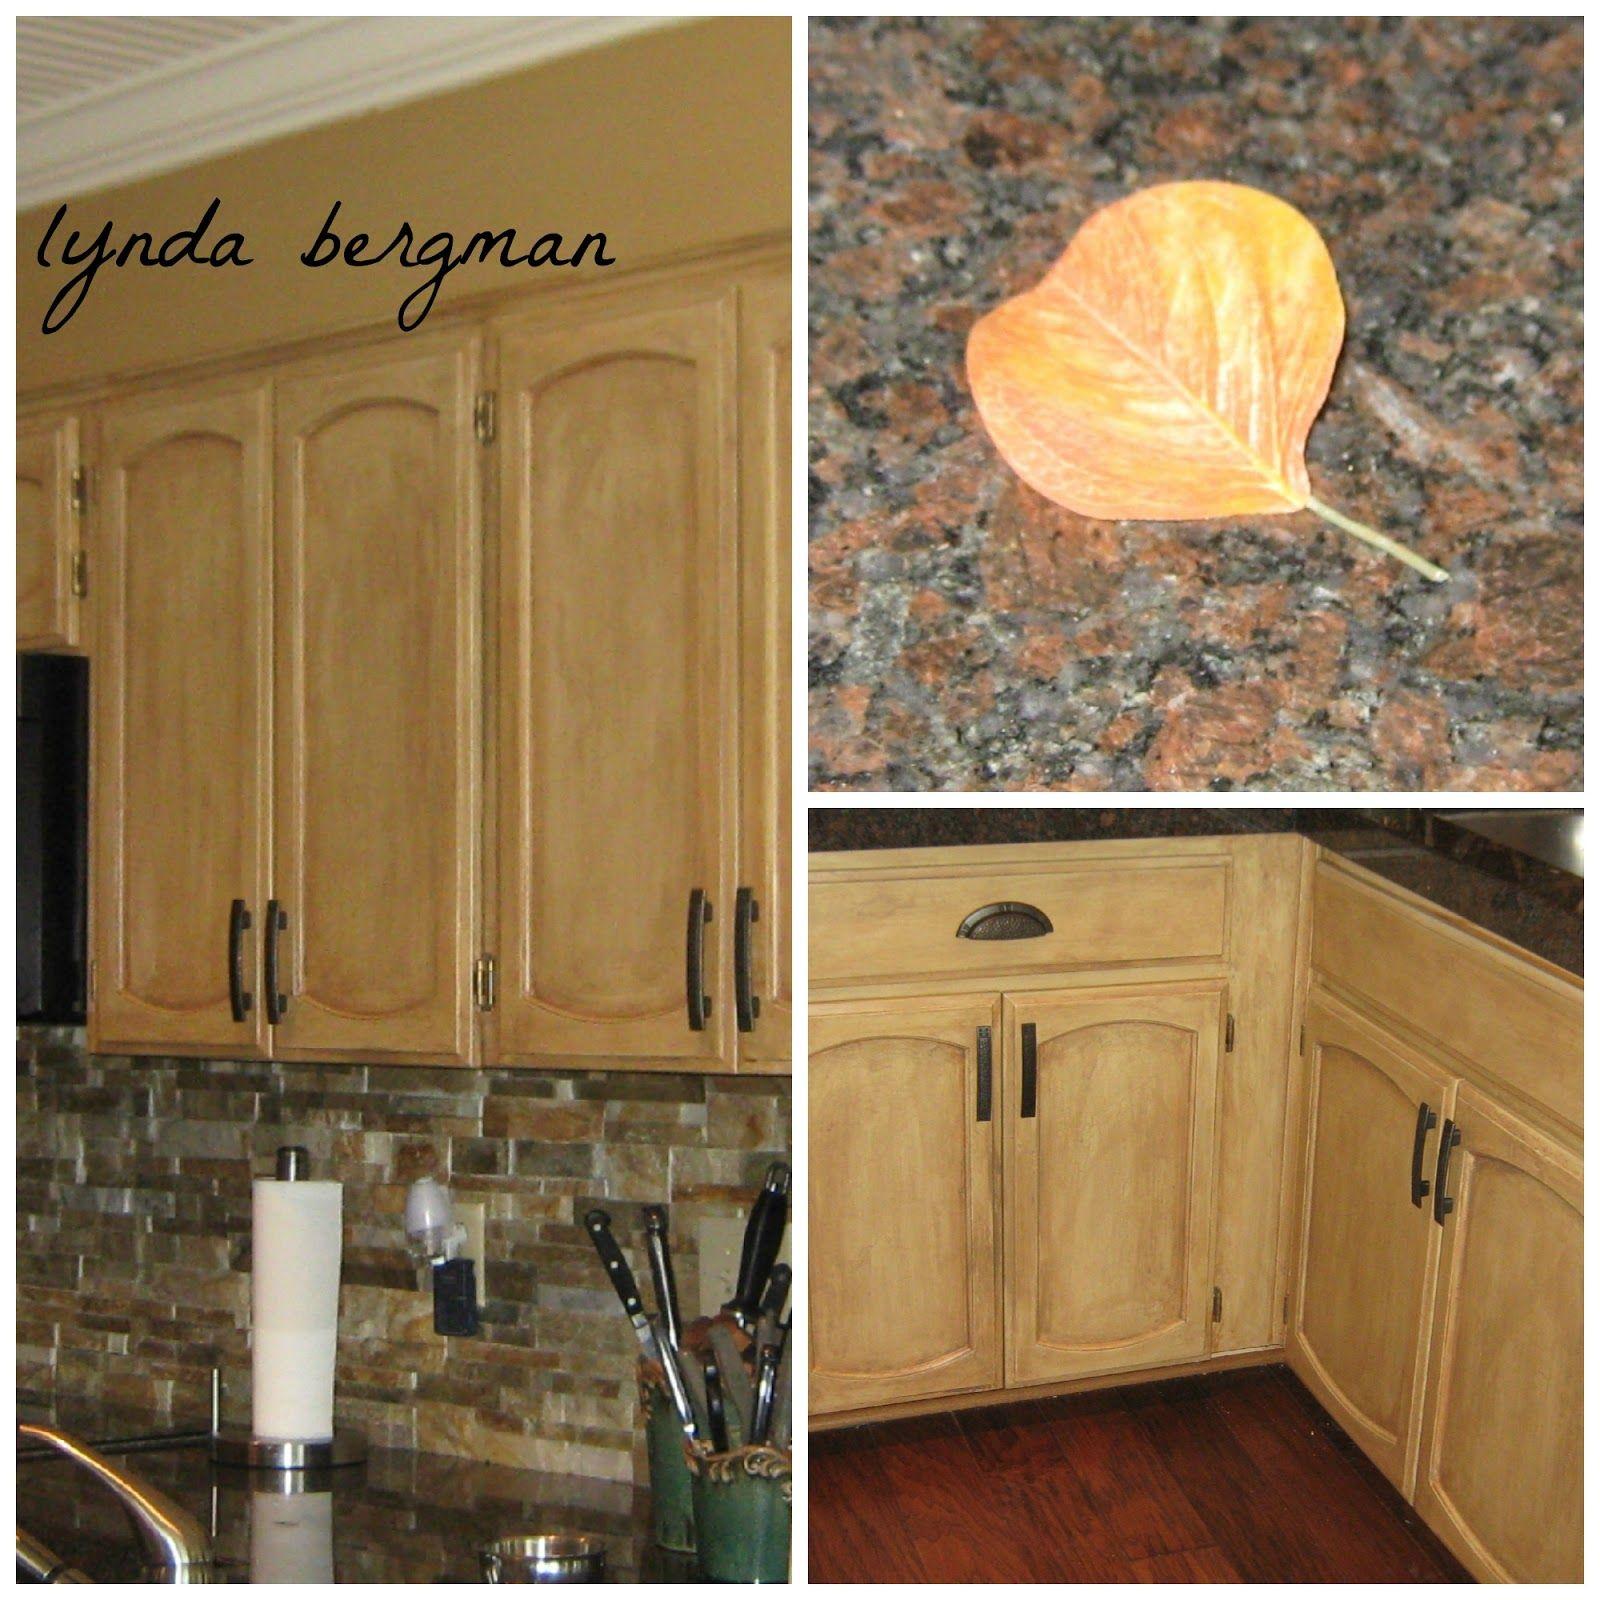 Decorative Kitchen Cabinets Lynda Bergman Decorative Artisan Lindas New Kitchen Cabinets